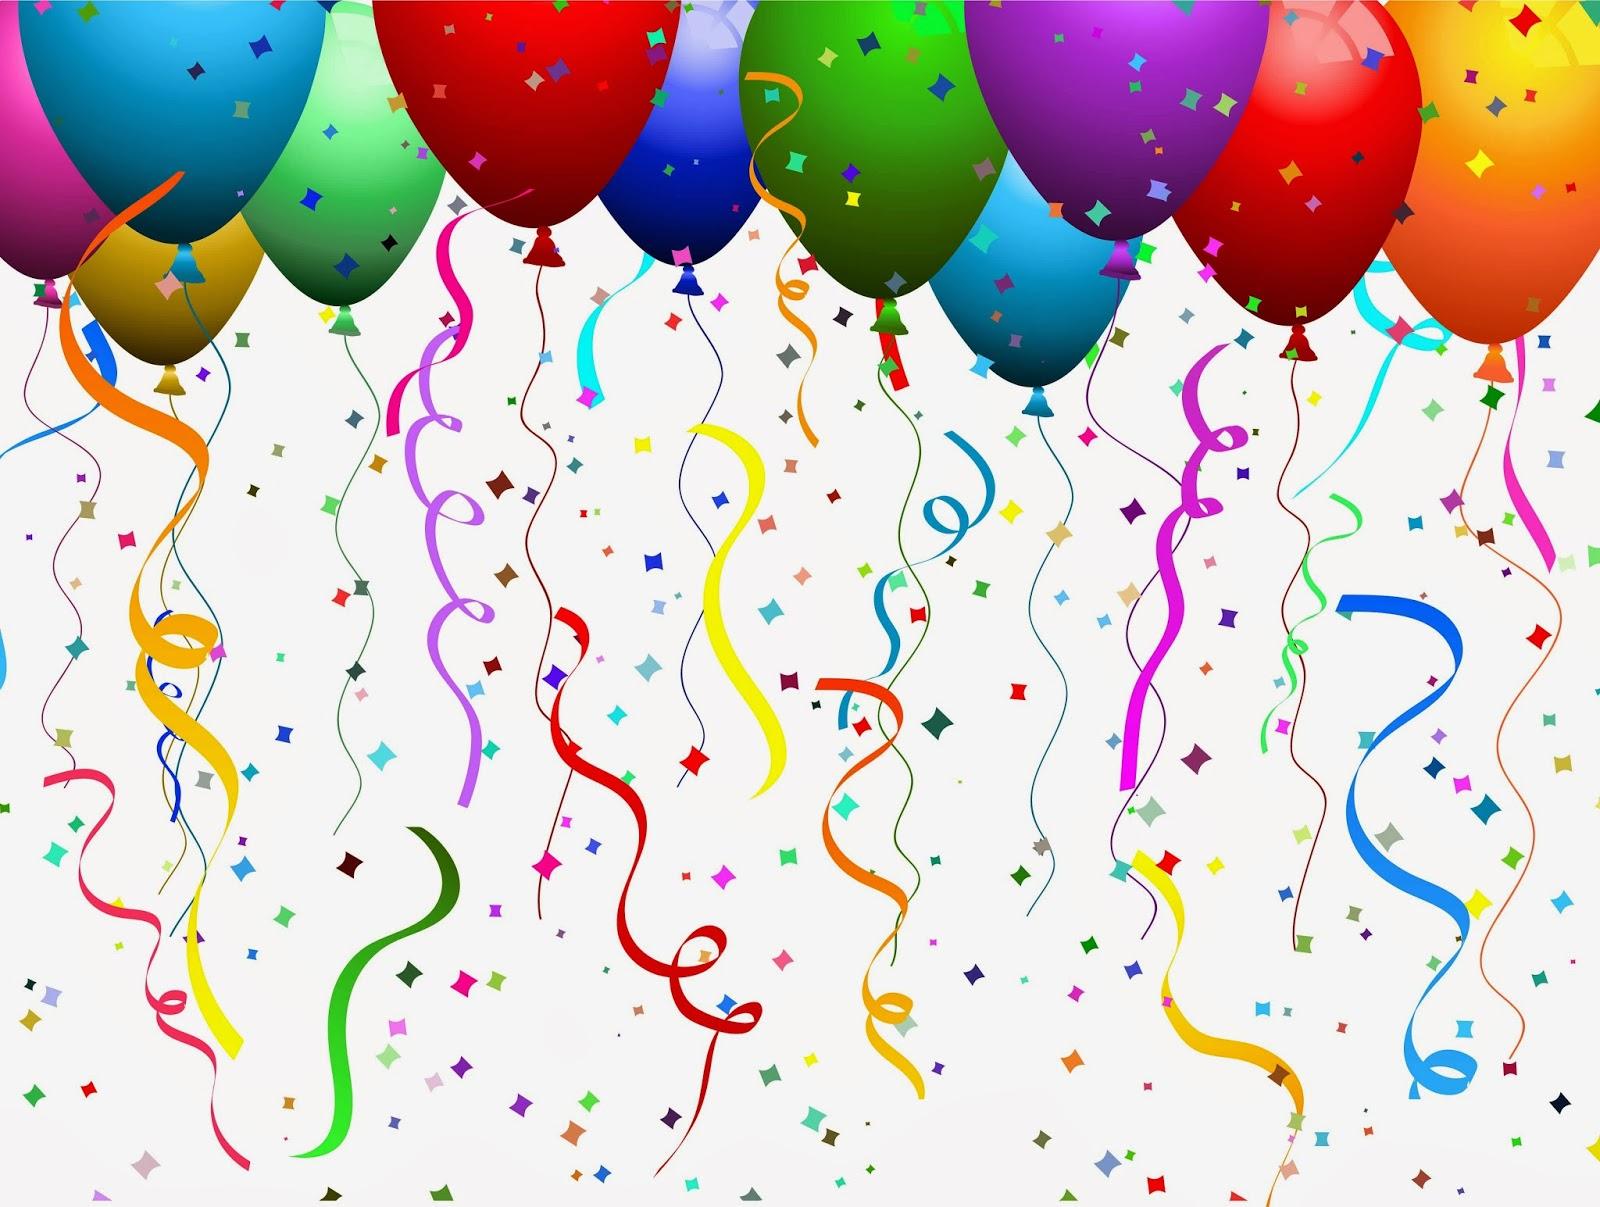 amazing balloons celebration for birthday wishes amazing birthday 1600x1207